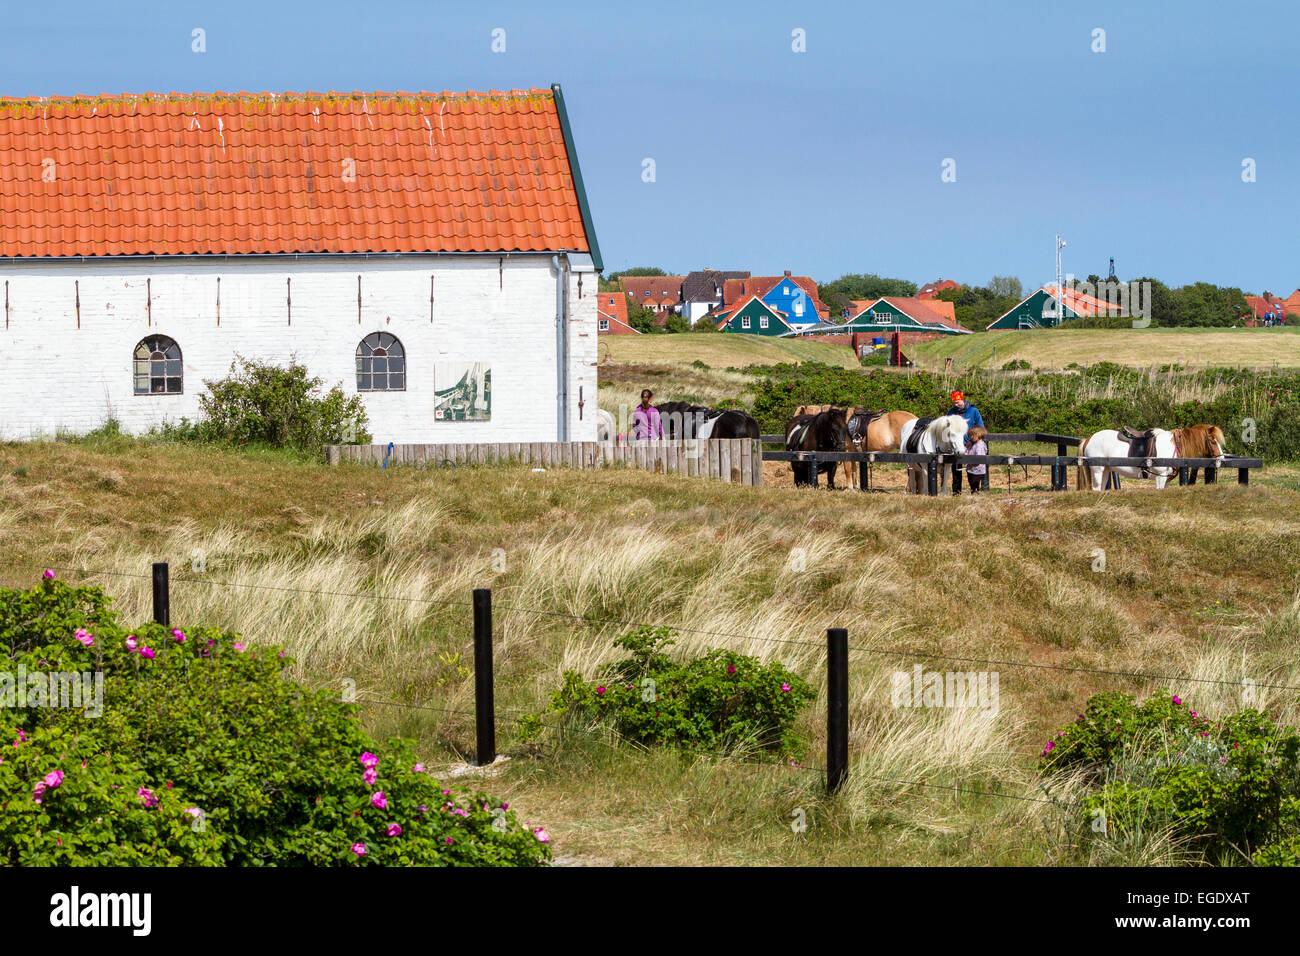 Horse Riding, stables on Spiekeroog Island, Nationalpark, North Sea, East Frisian Islands, East Frisia, Lower Saxony, - Stock Image